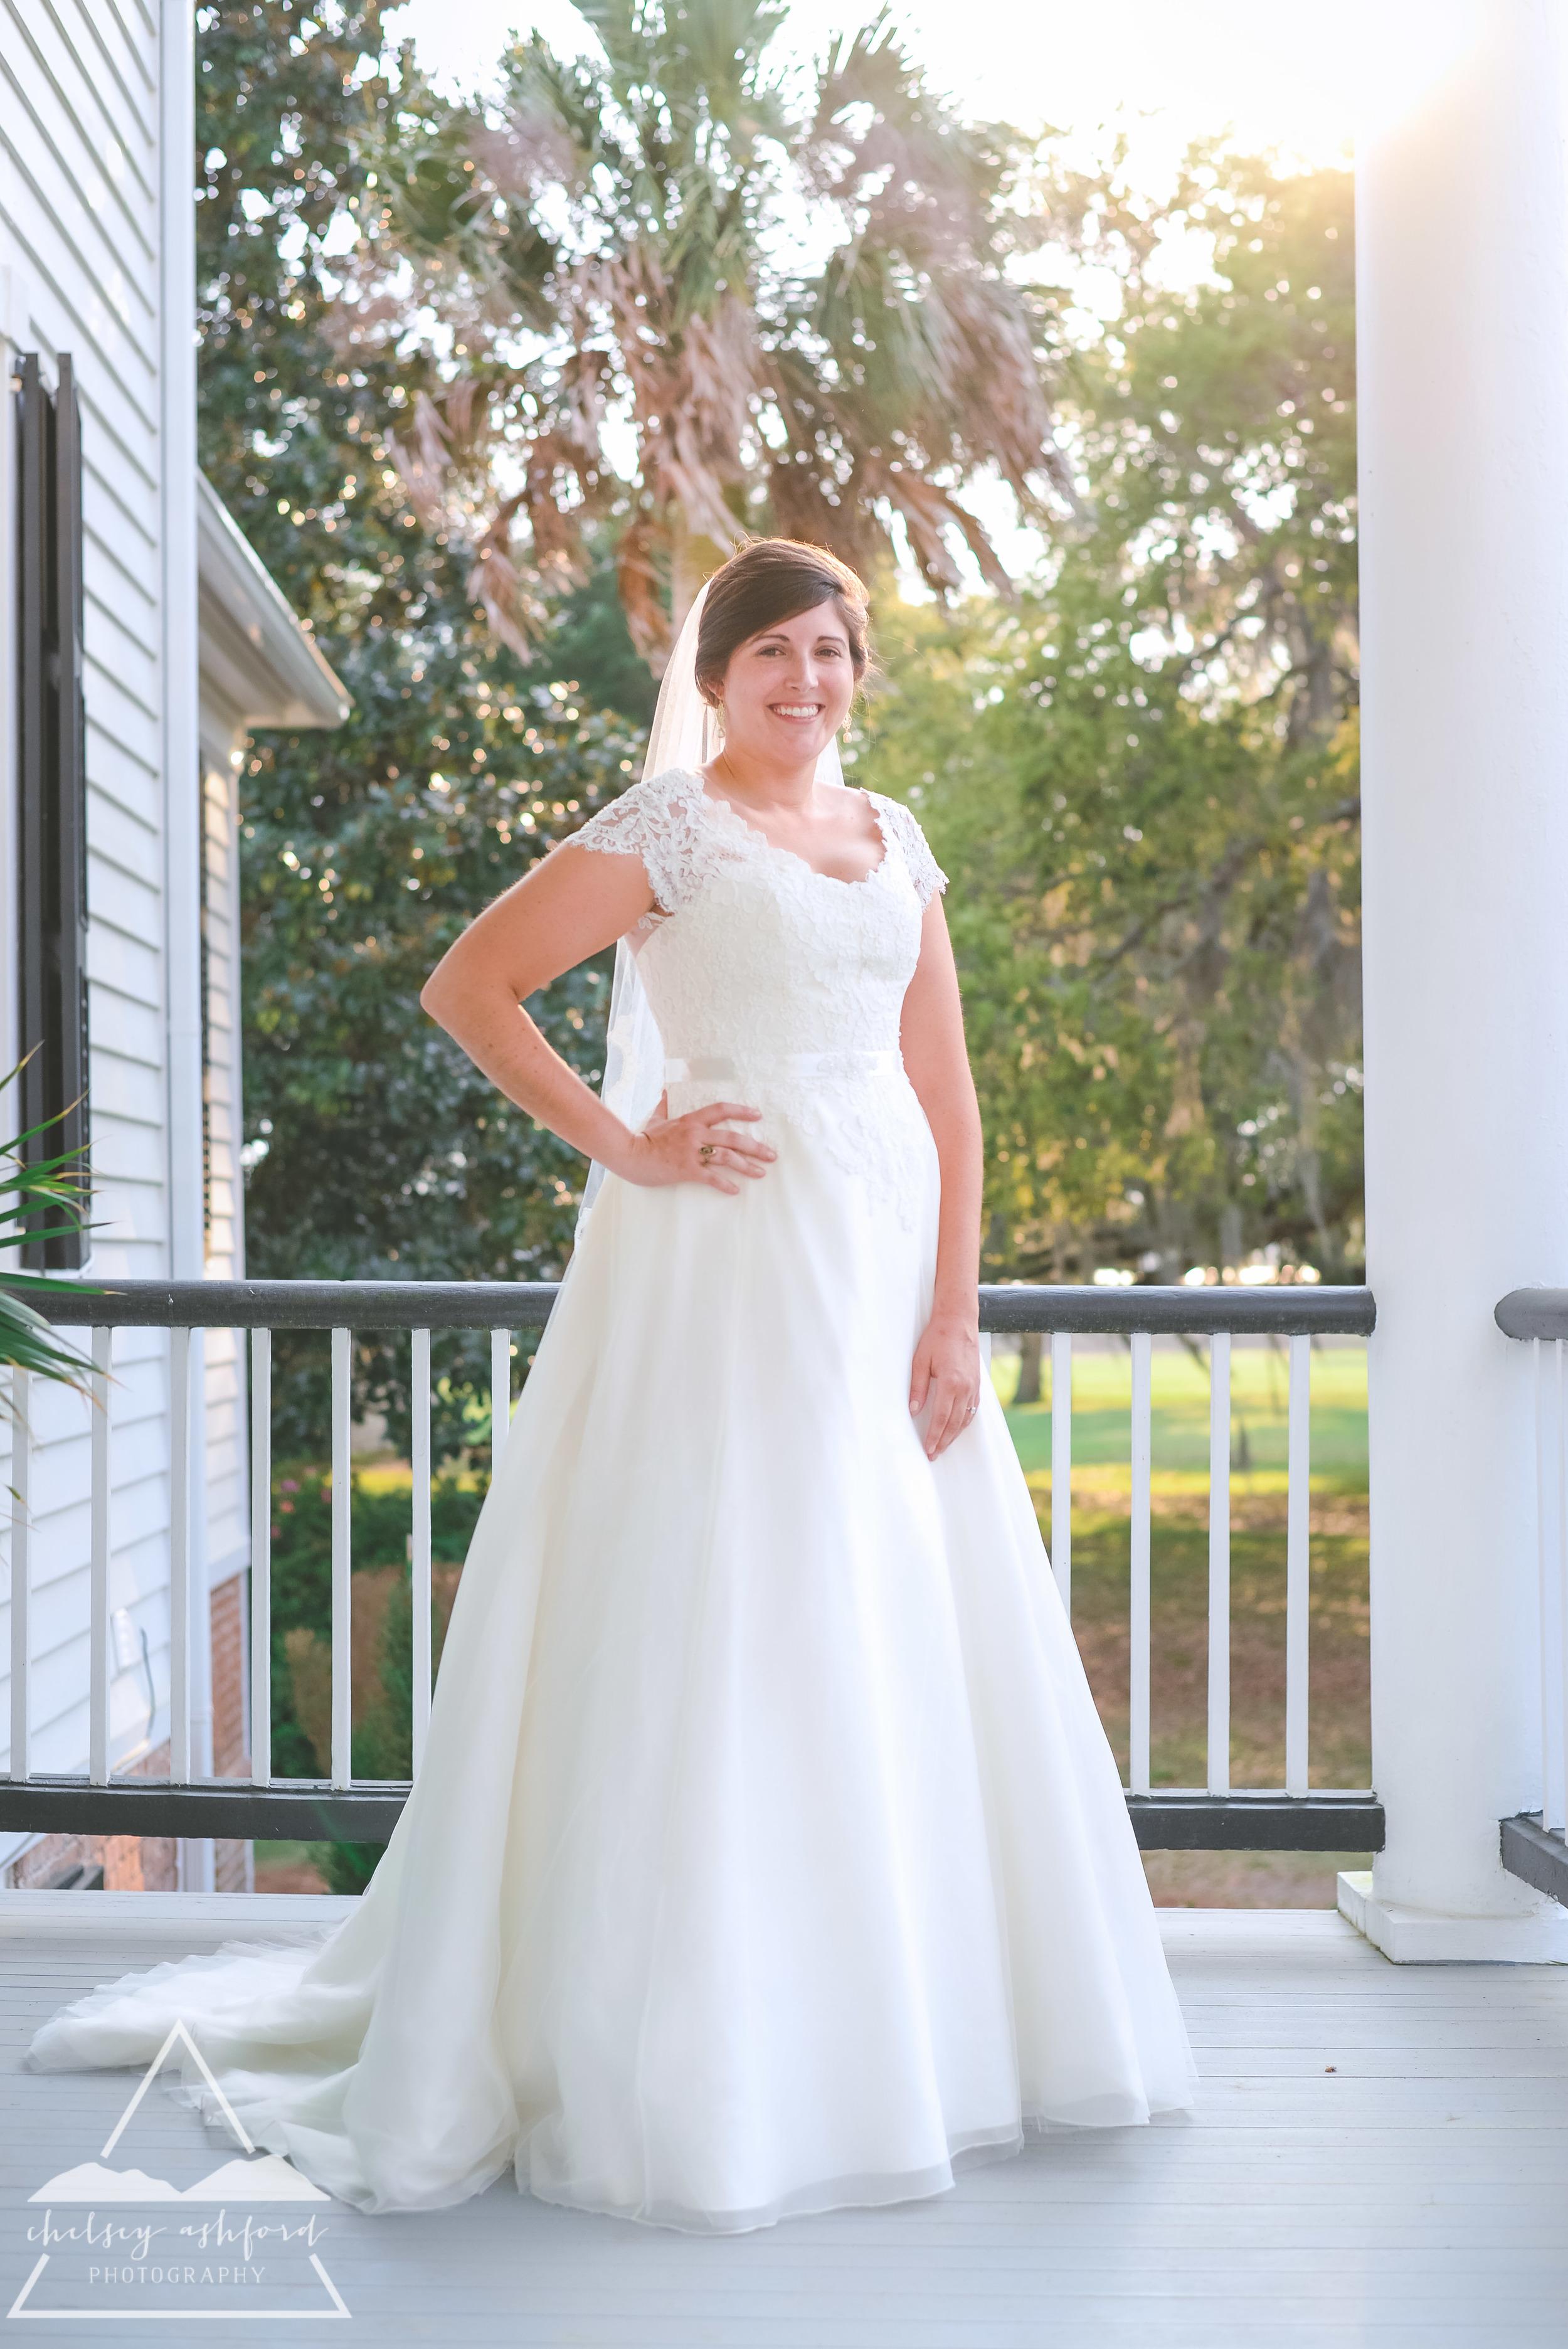 Sylvia_bridals_web-2.jpg